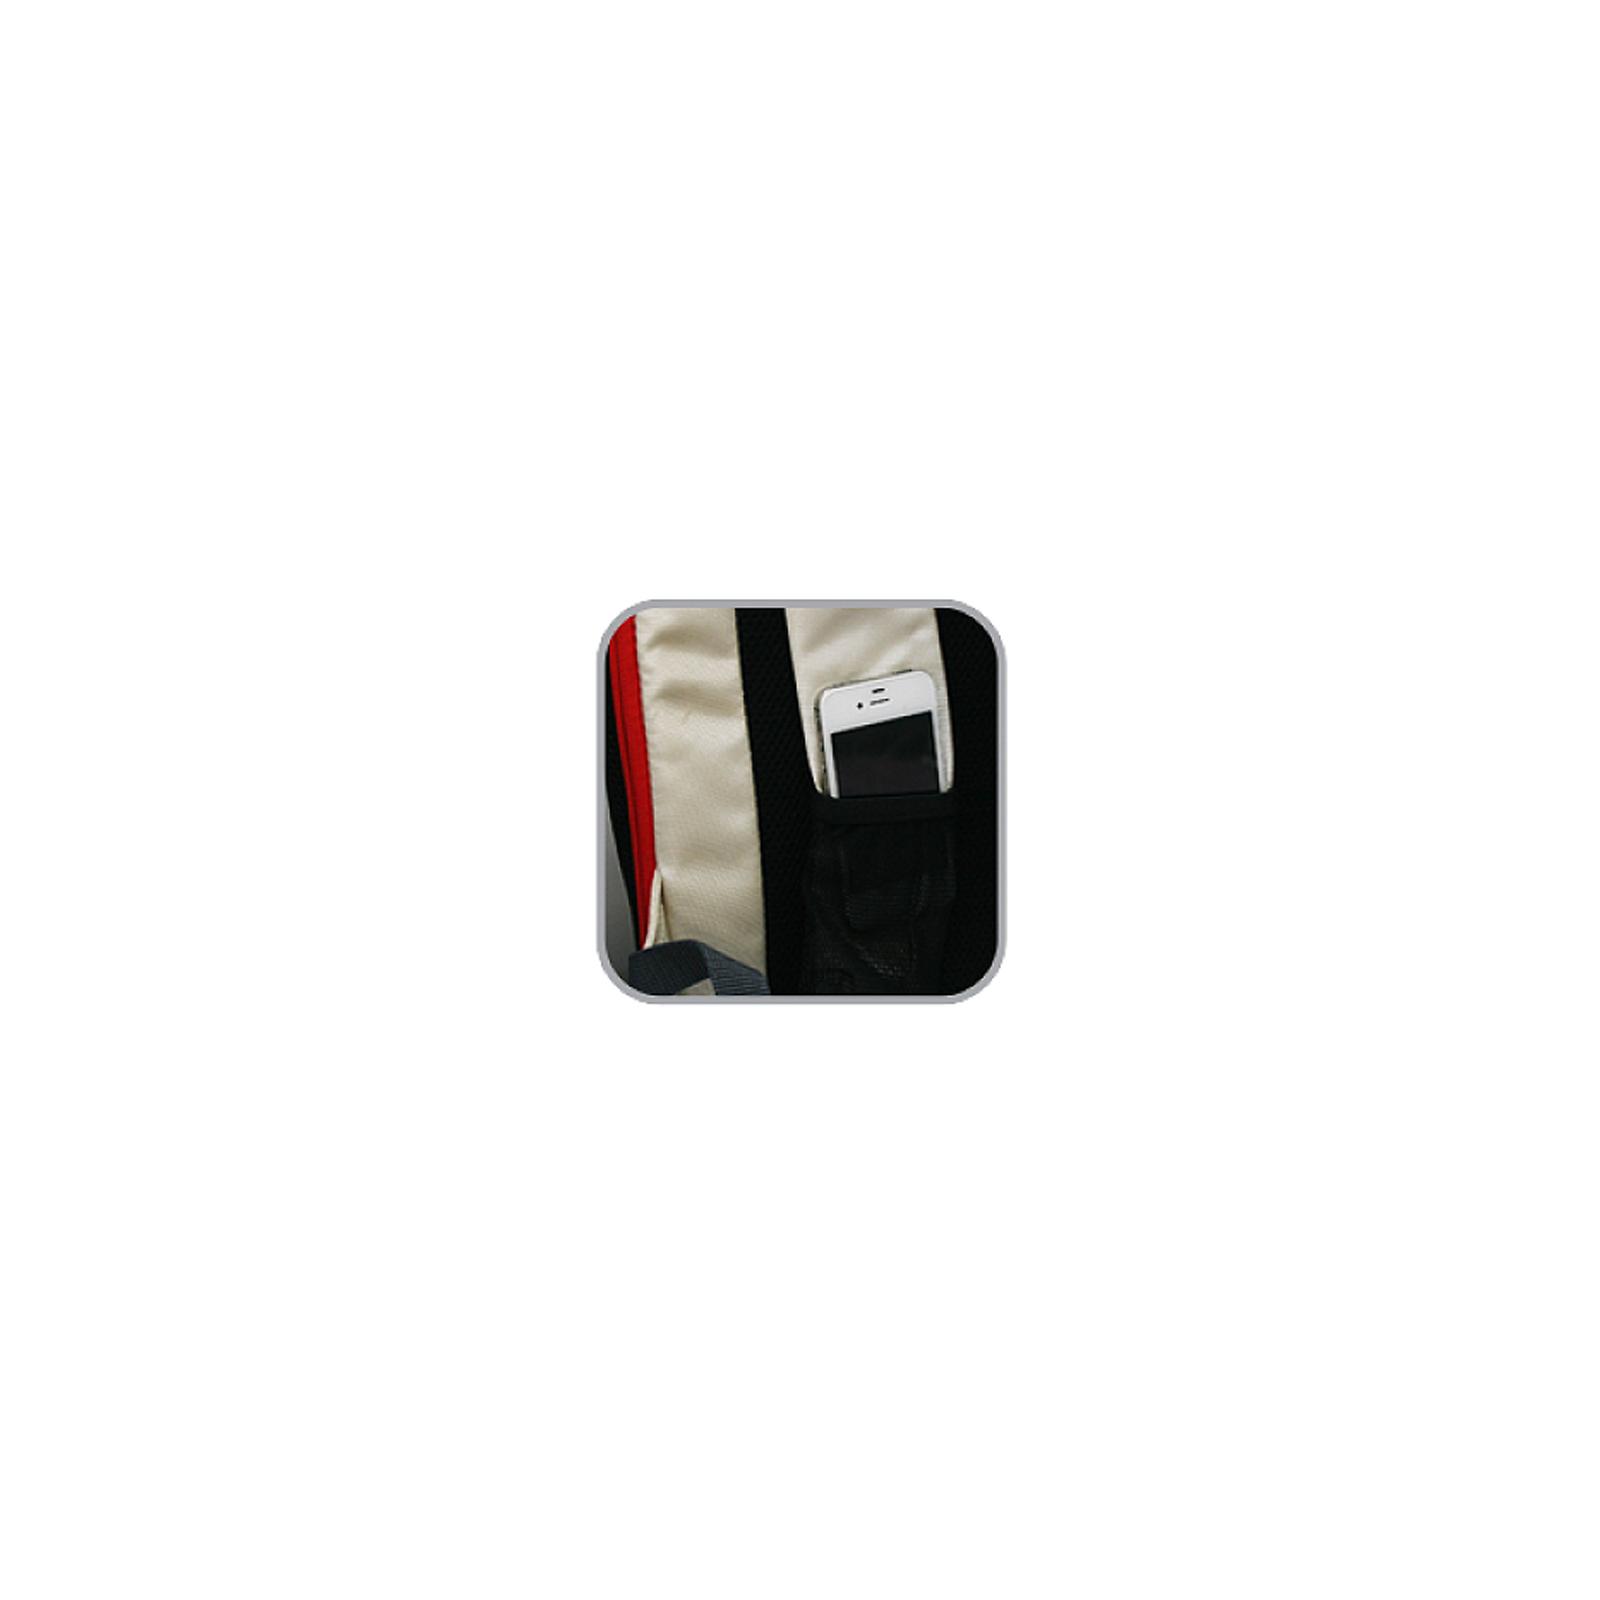 Рюкзак для ноутбука Crown 15.6 Harmony black and red (BPH3315BR) изображение 6